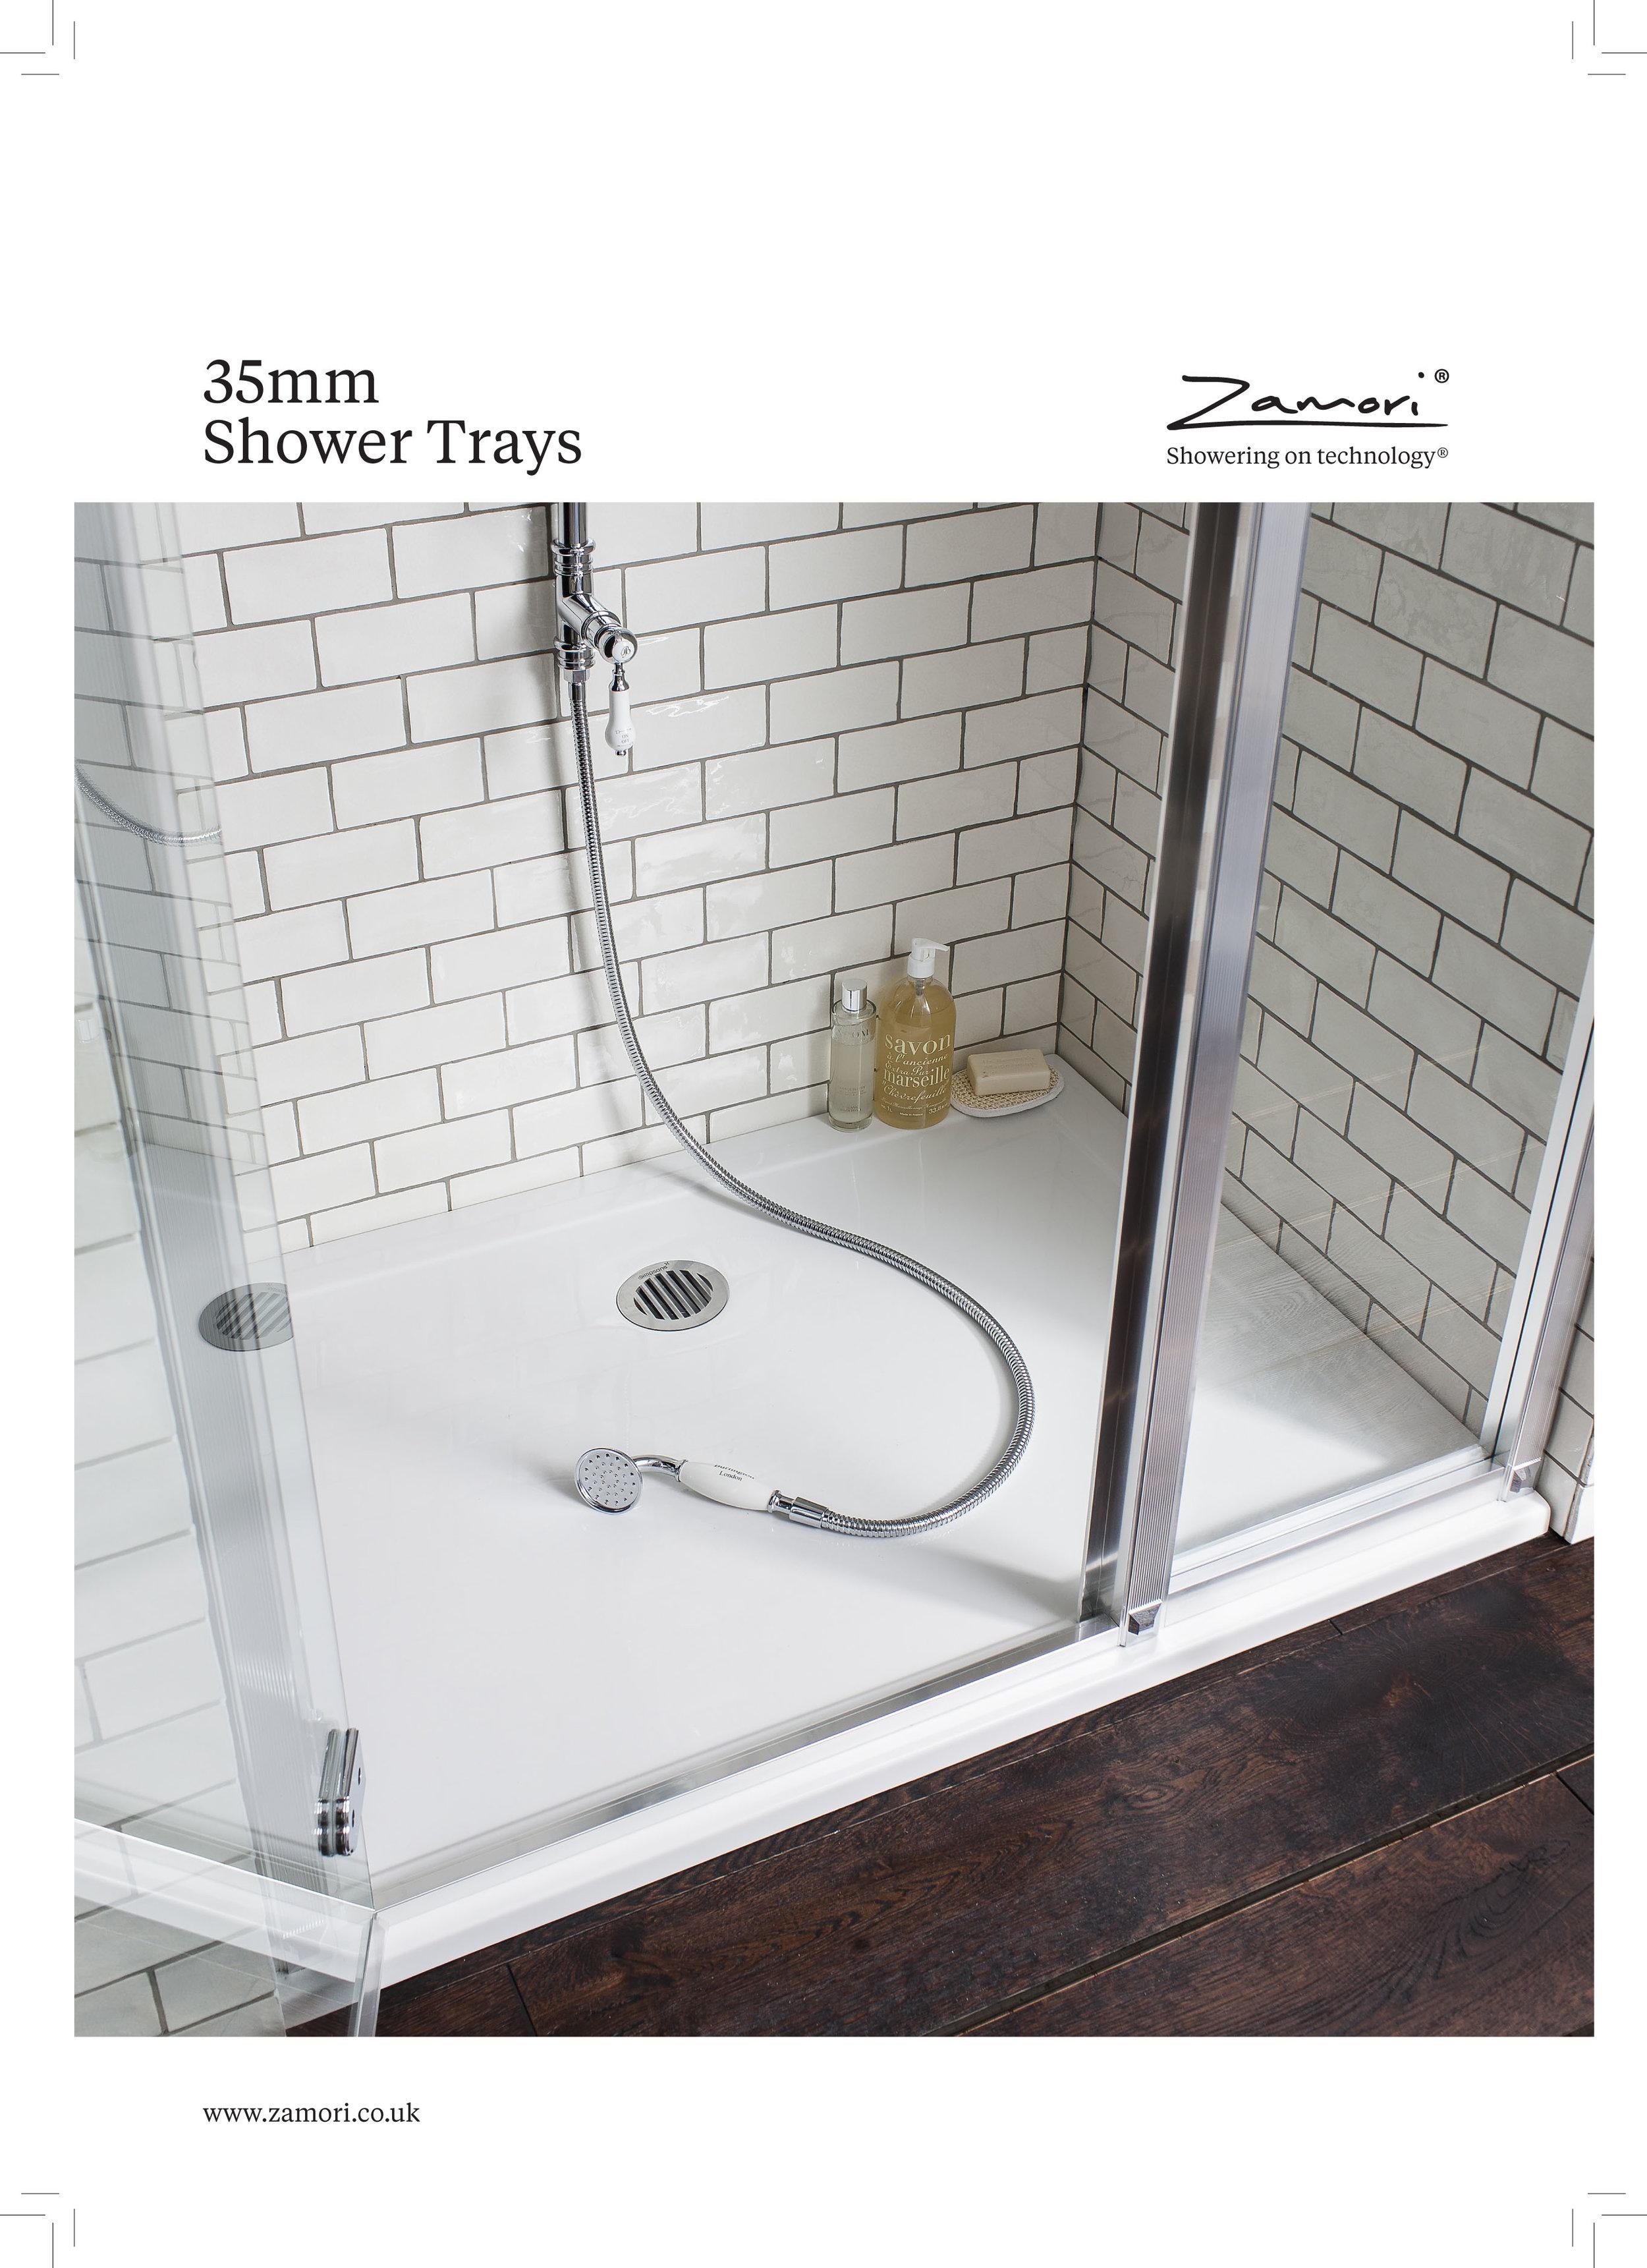 Zamori Brochure Waterloo Bathrooms Dublin.jpg